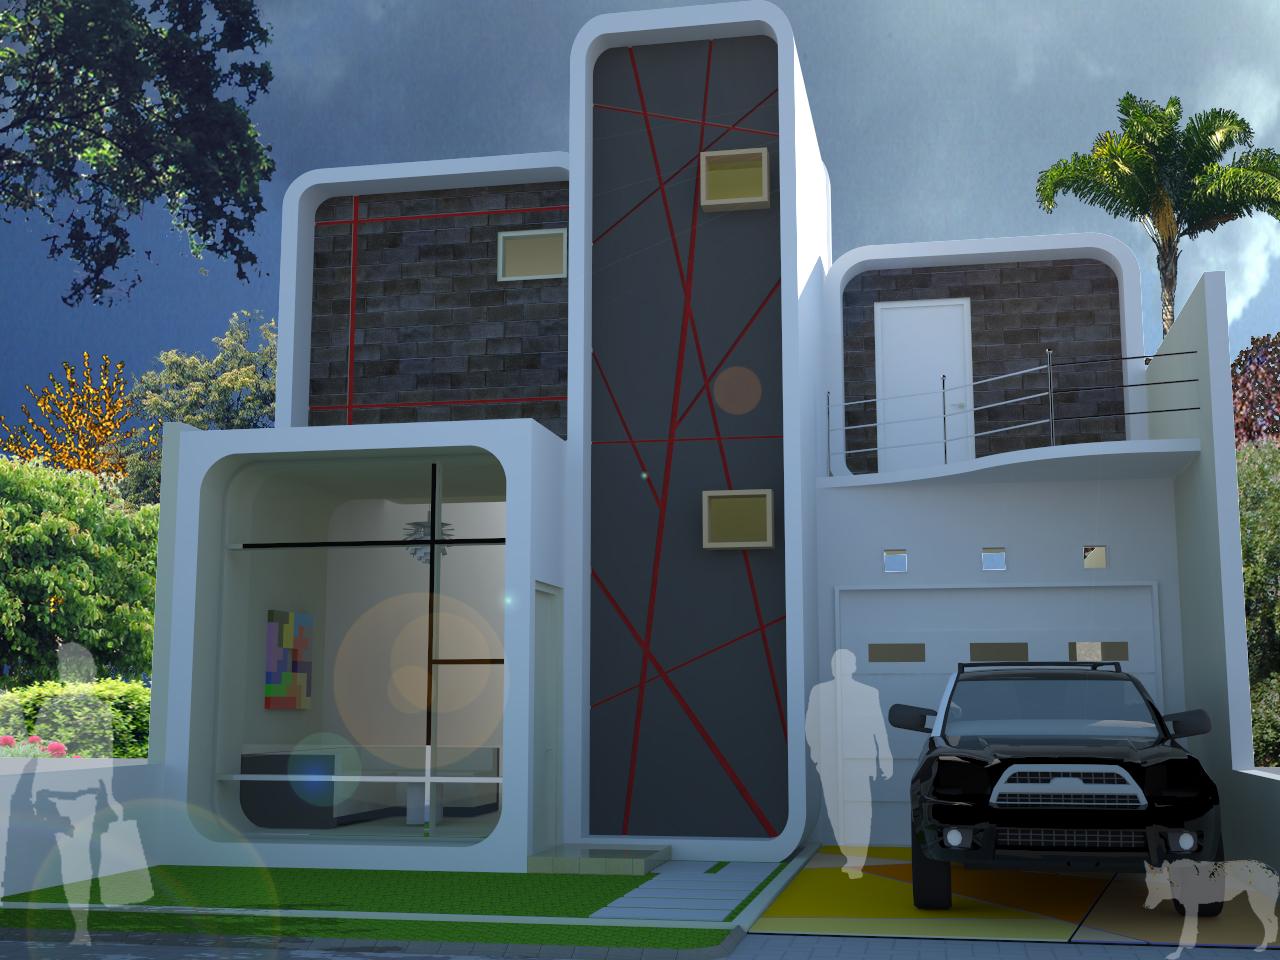 Rumah Mungil Nan Ber Estetika Part 2 4Linked Architect